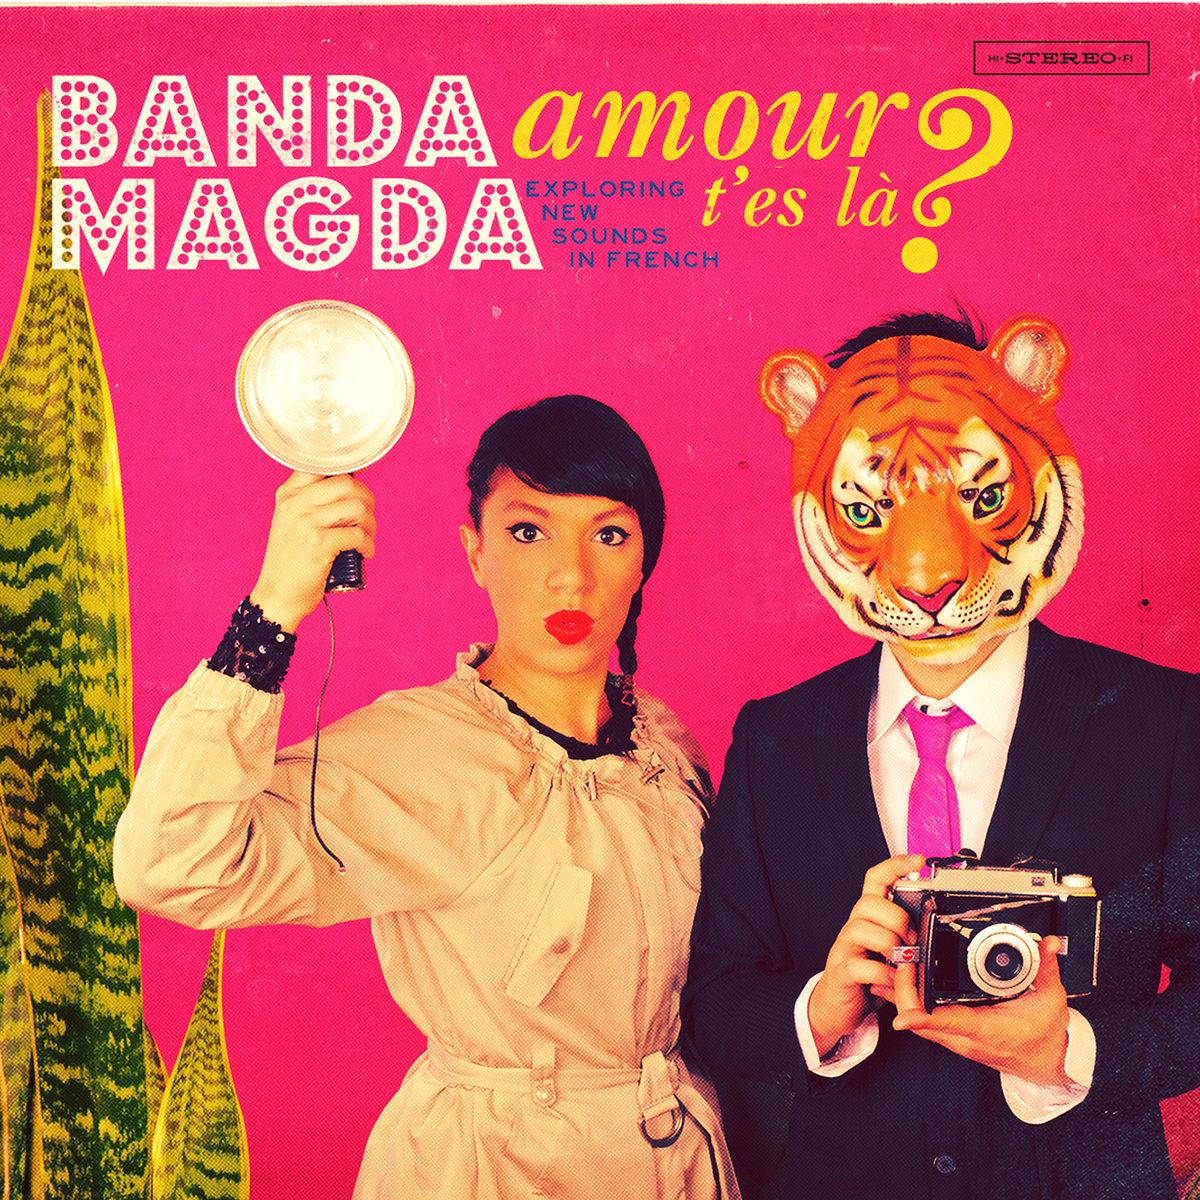 bandamagda amour t'es la.jpg